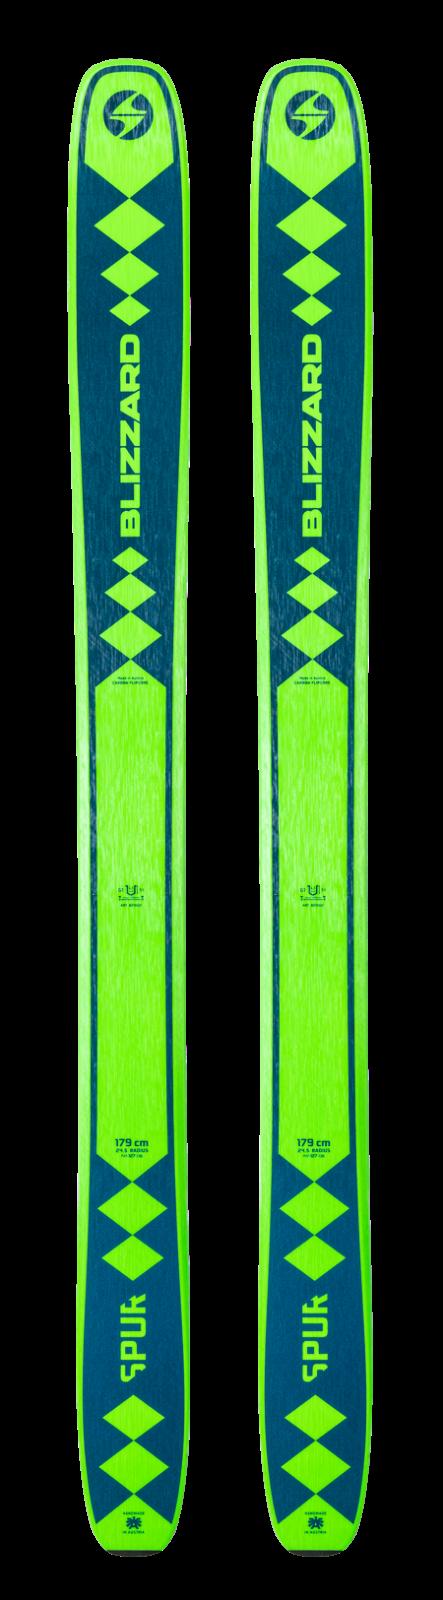 Blizzard Spur Skis 2021